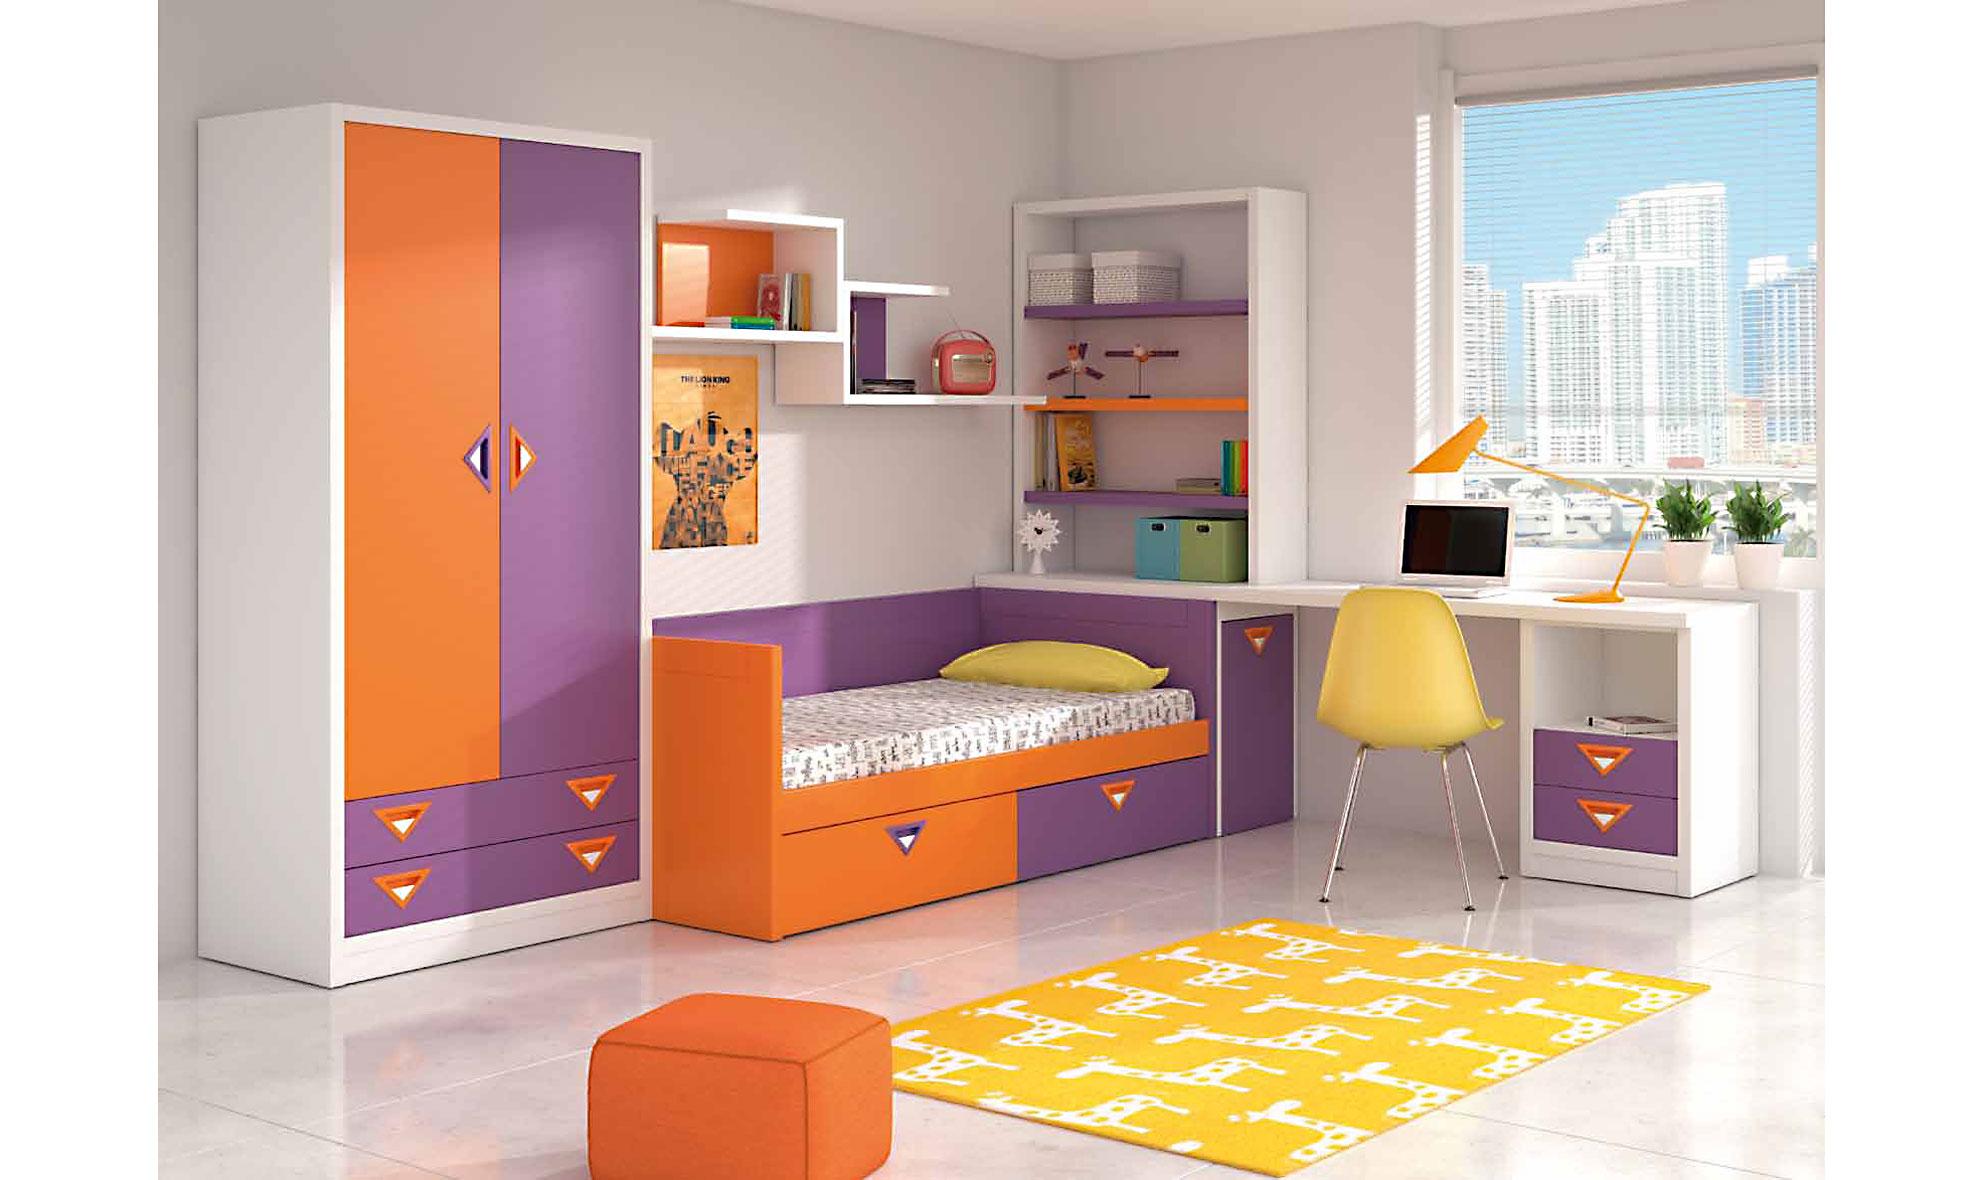 Dormitorio infantil janet en - Portobello decoracion ...